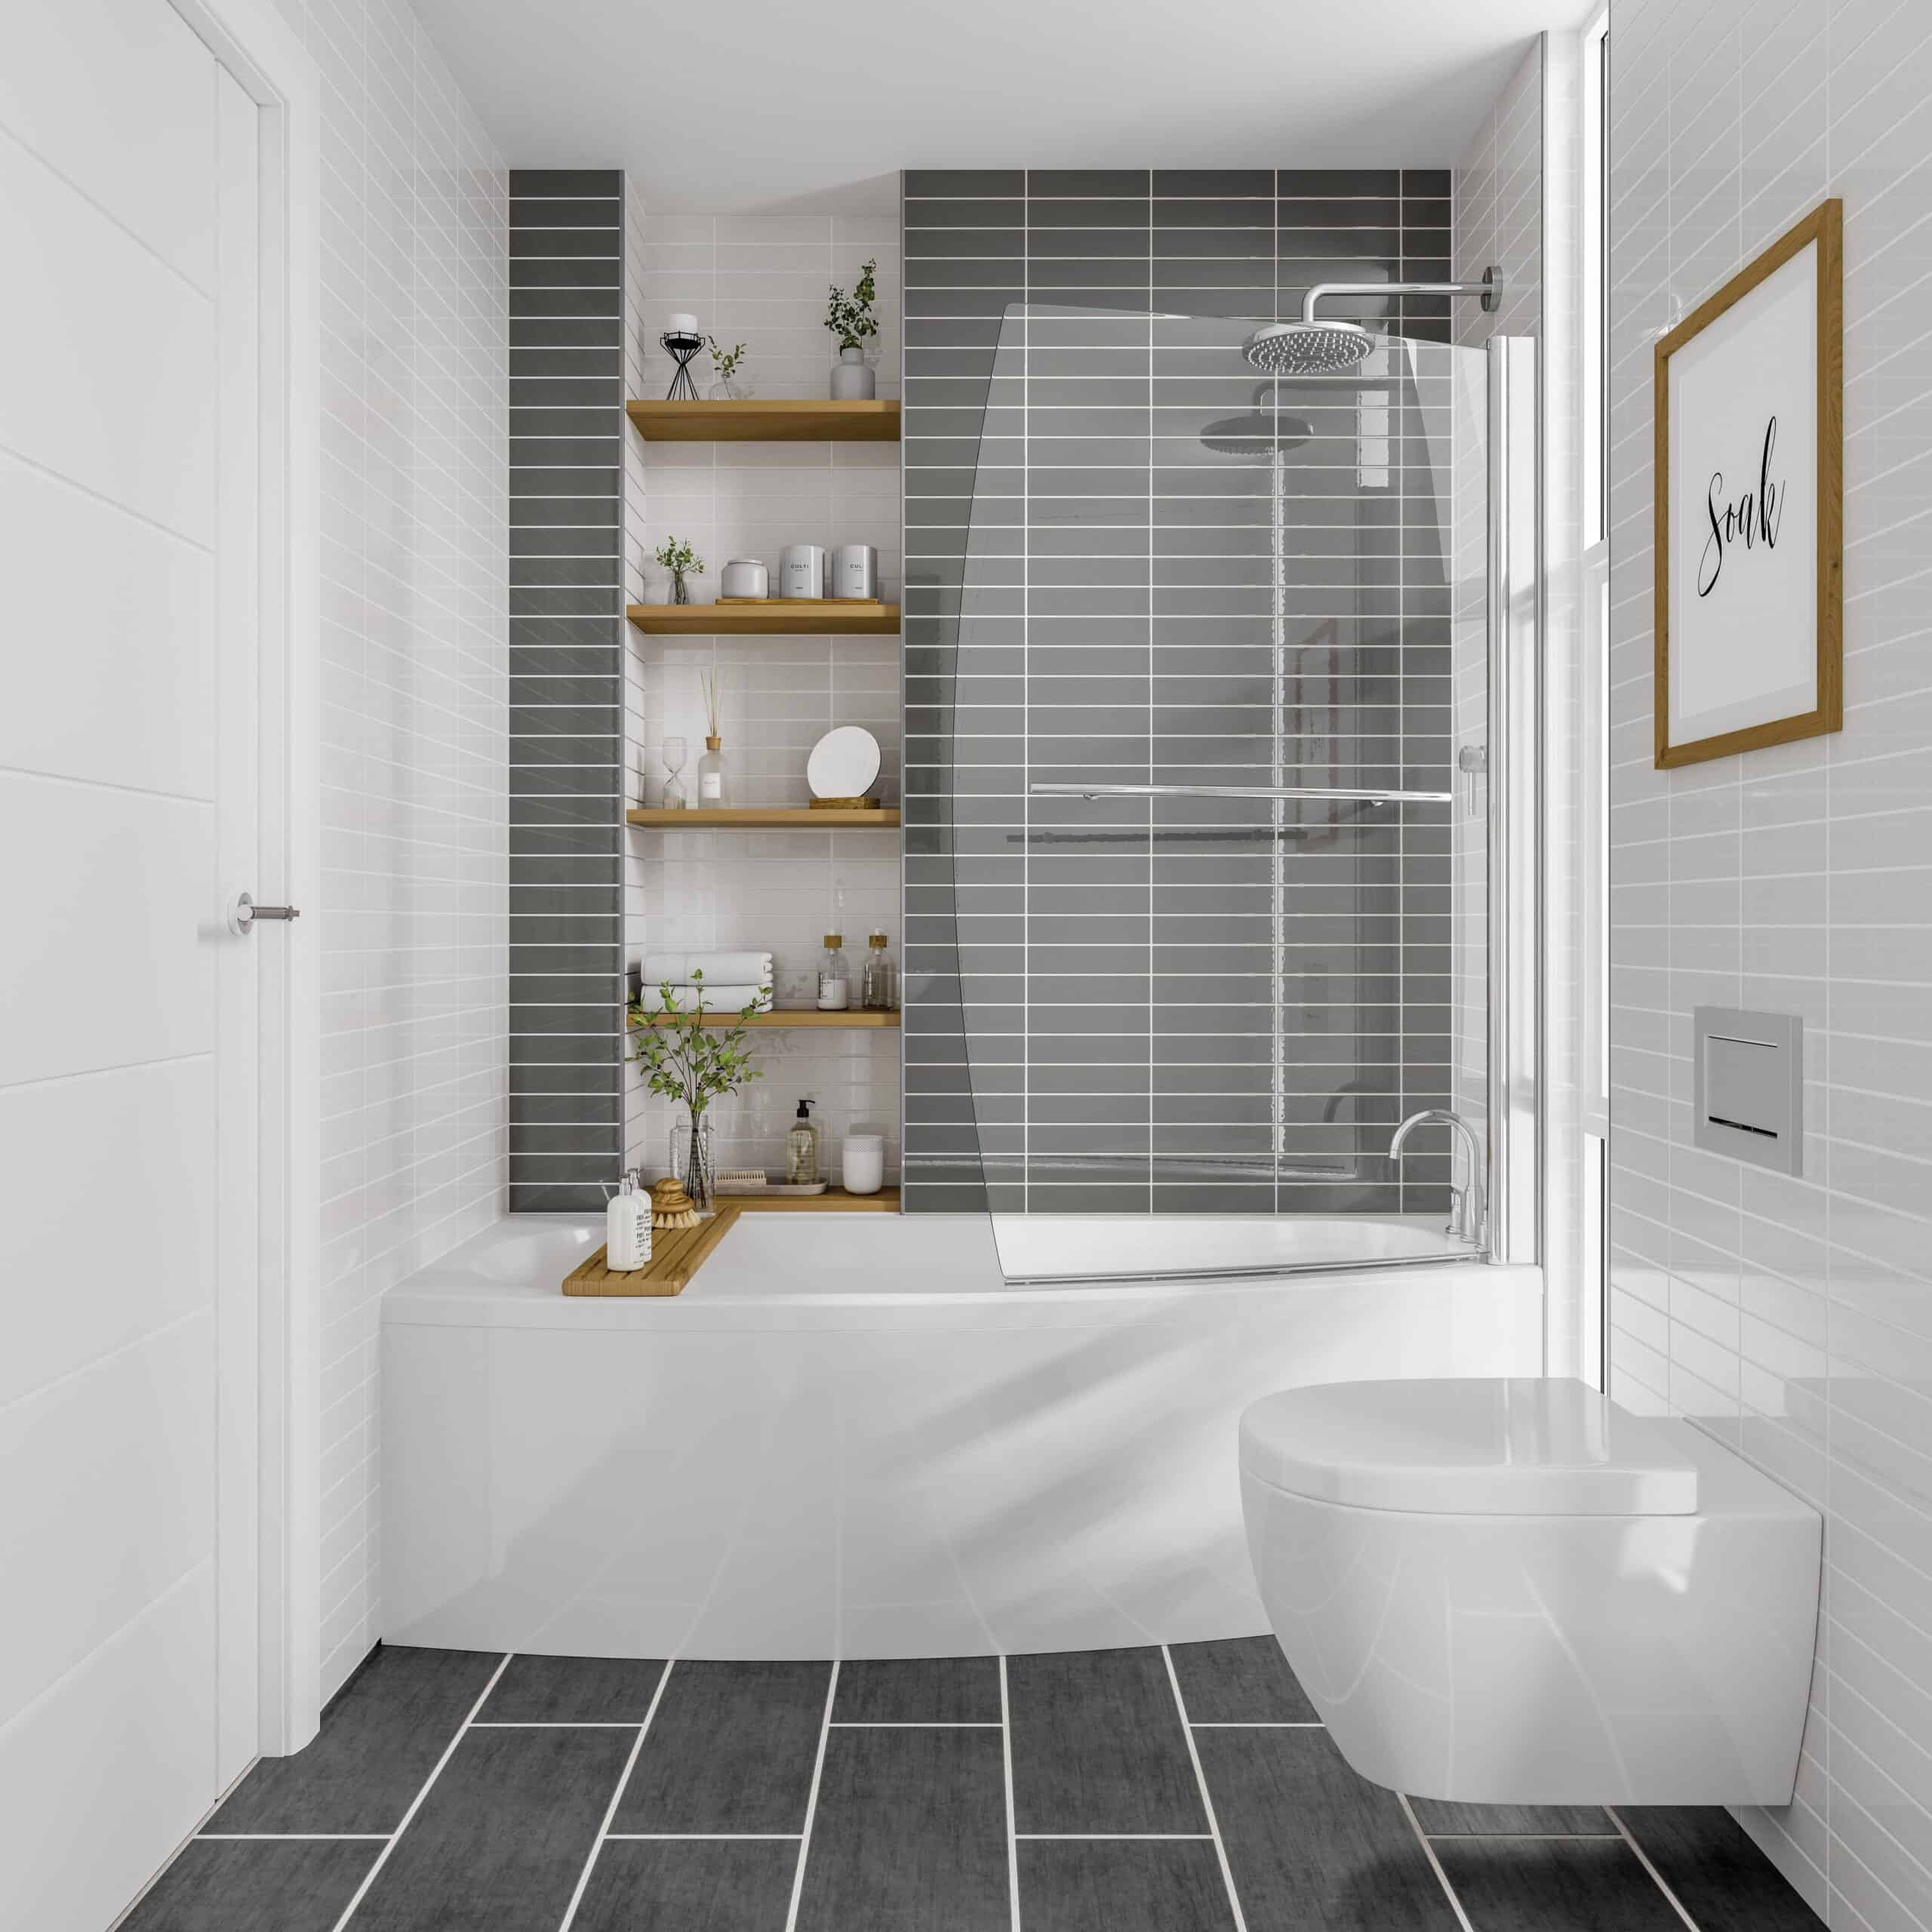 Space Saver Bath in grey tiled bathroom